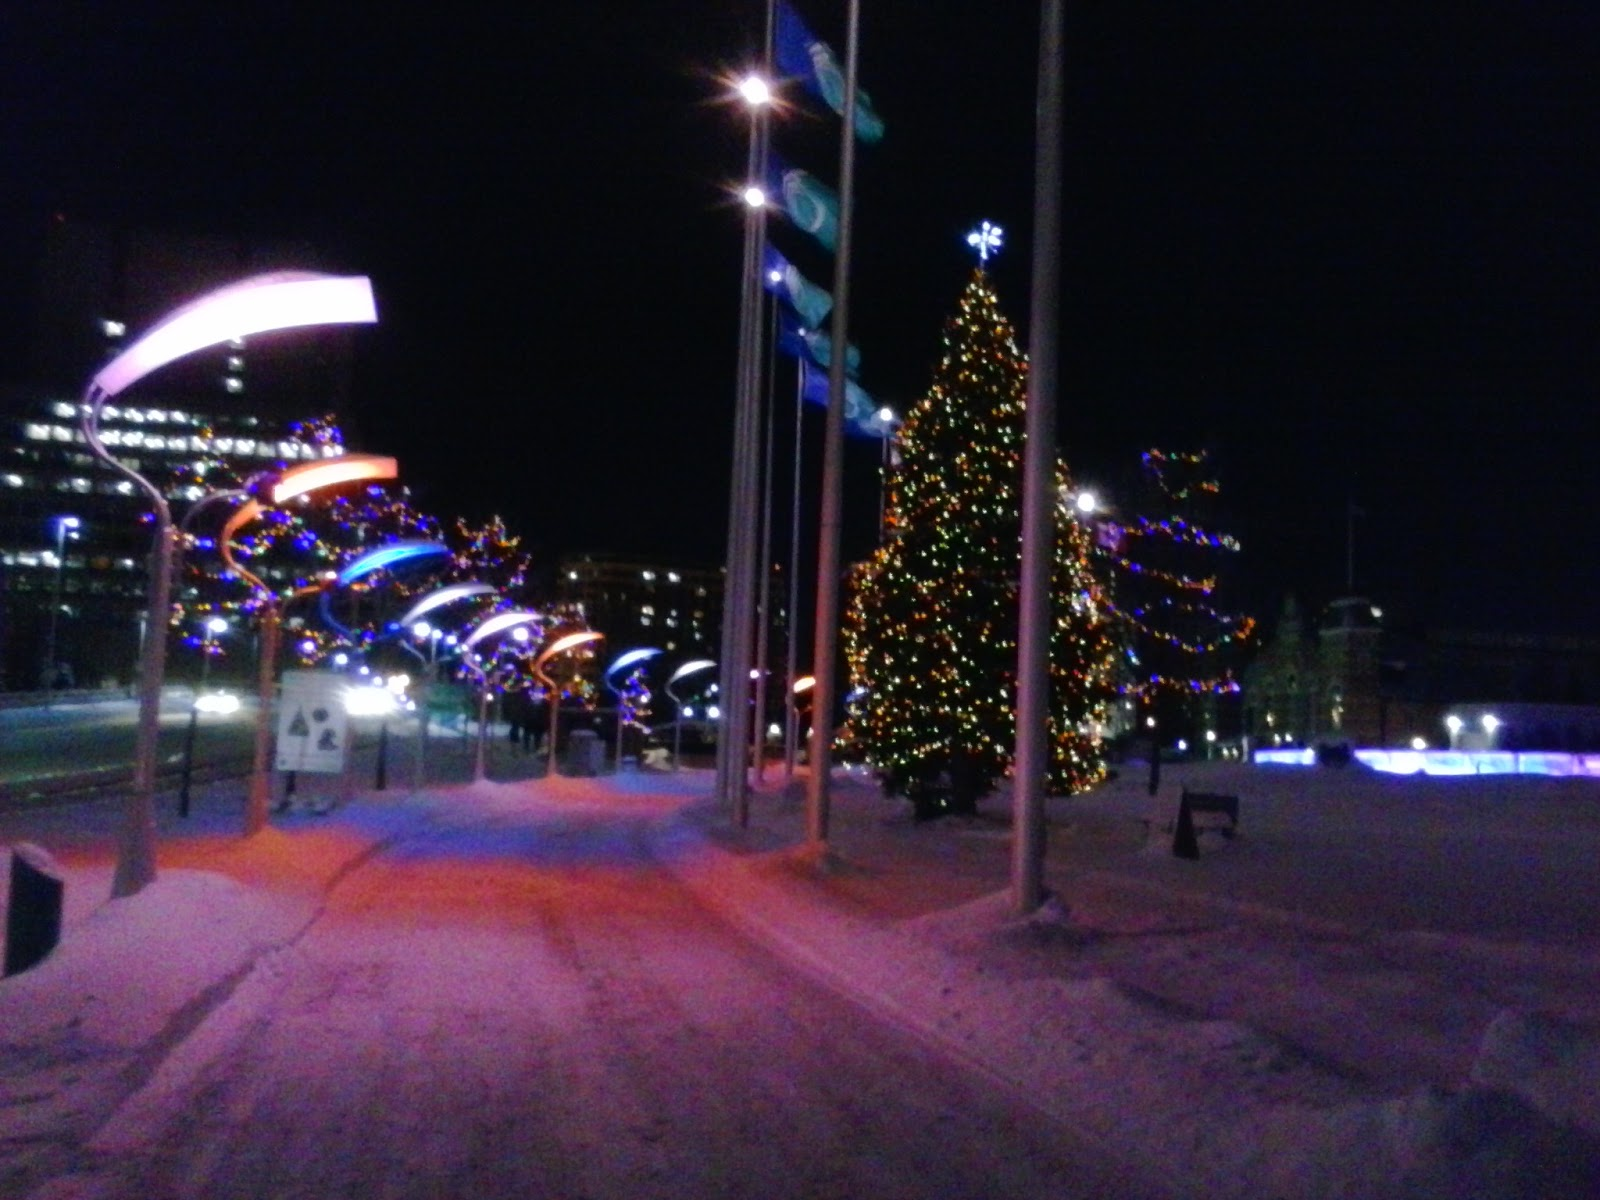 Christmas Decorations Up At Ottawa City Hall